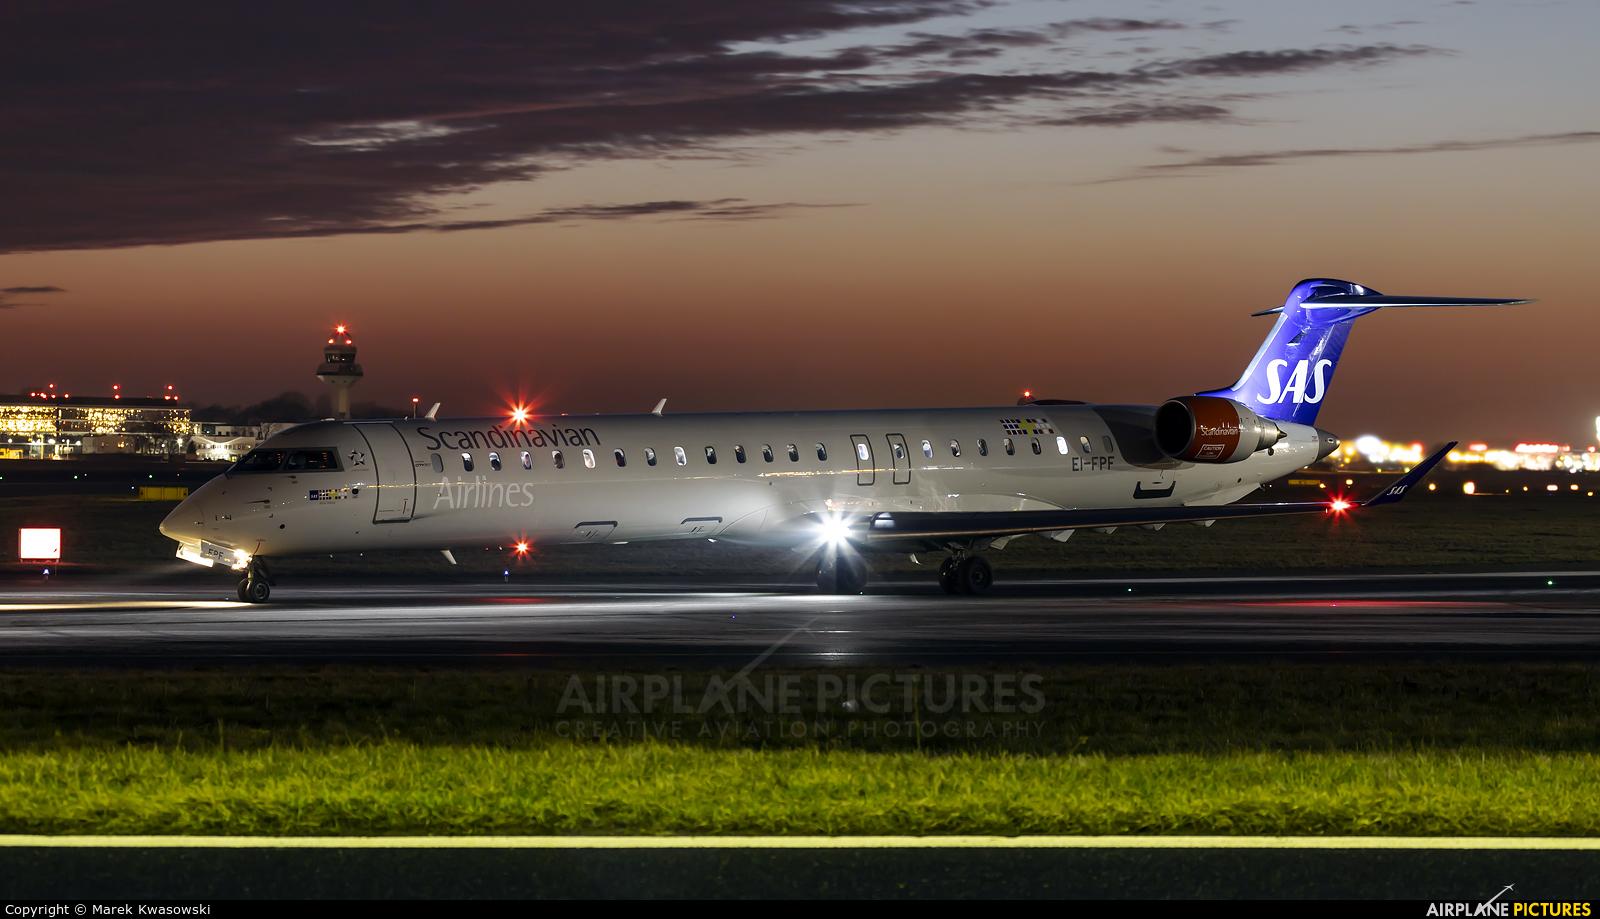 SAS - Scandinavian Airlines (CityJet) EI-FPF aircraft at Warsaw - Frederic Chopin